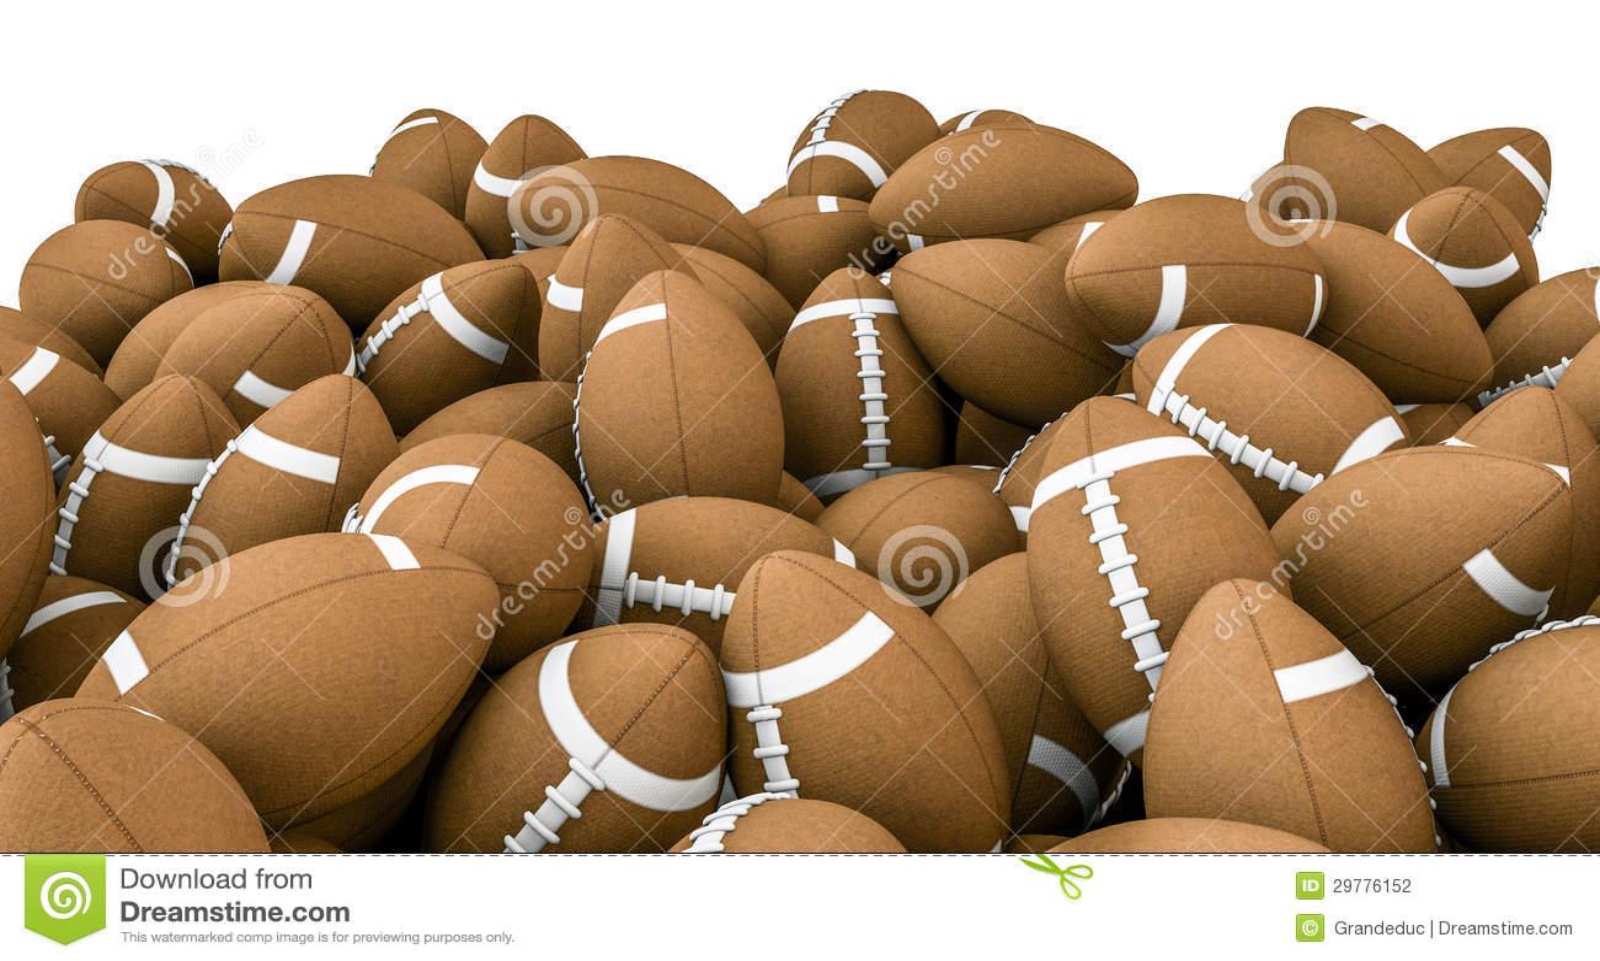 d-render-piled-american-footballs-297761